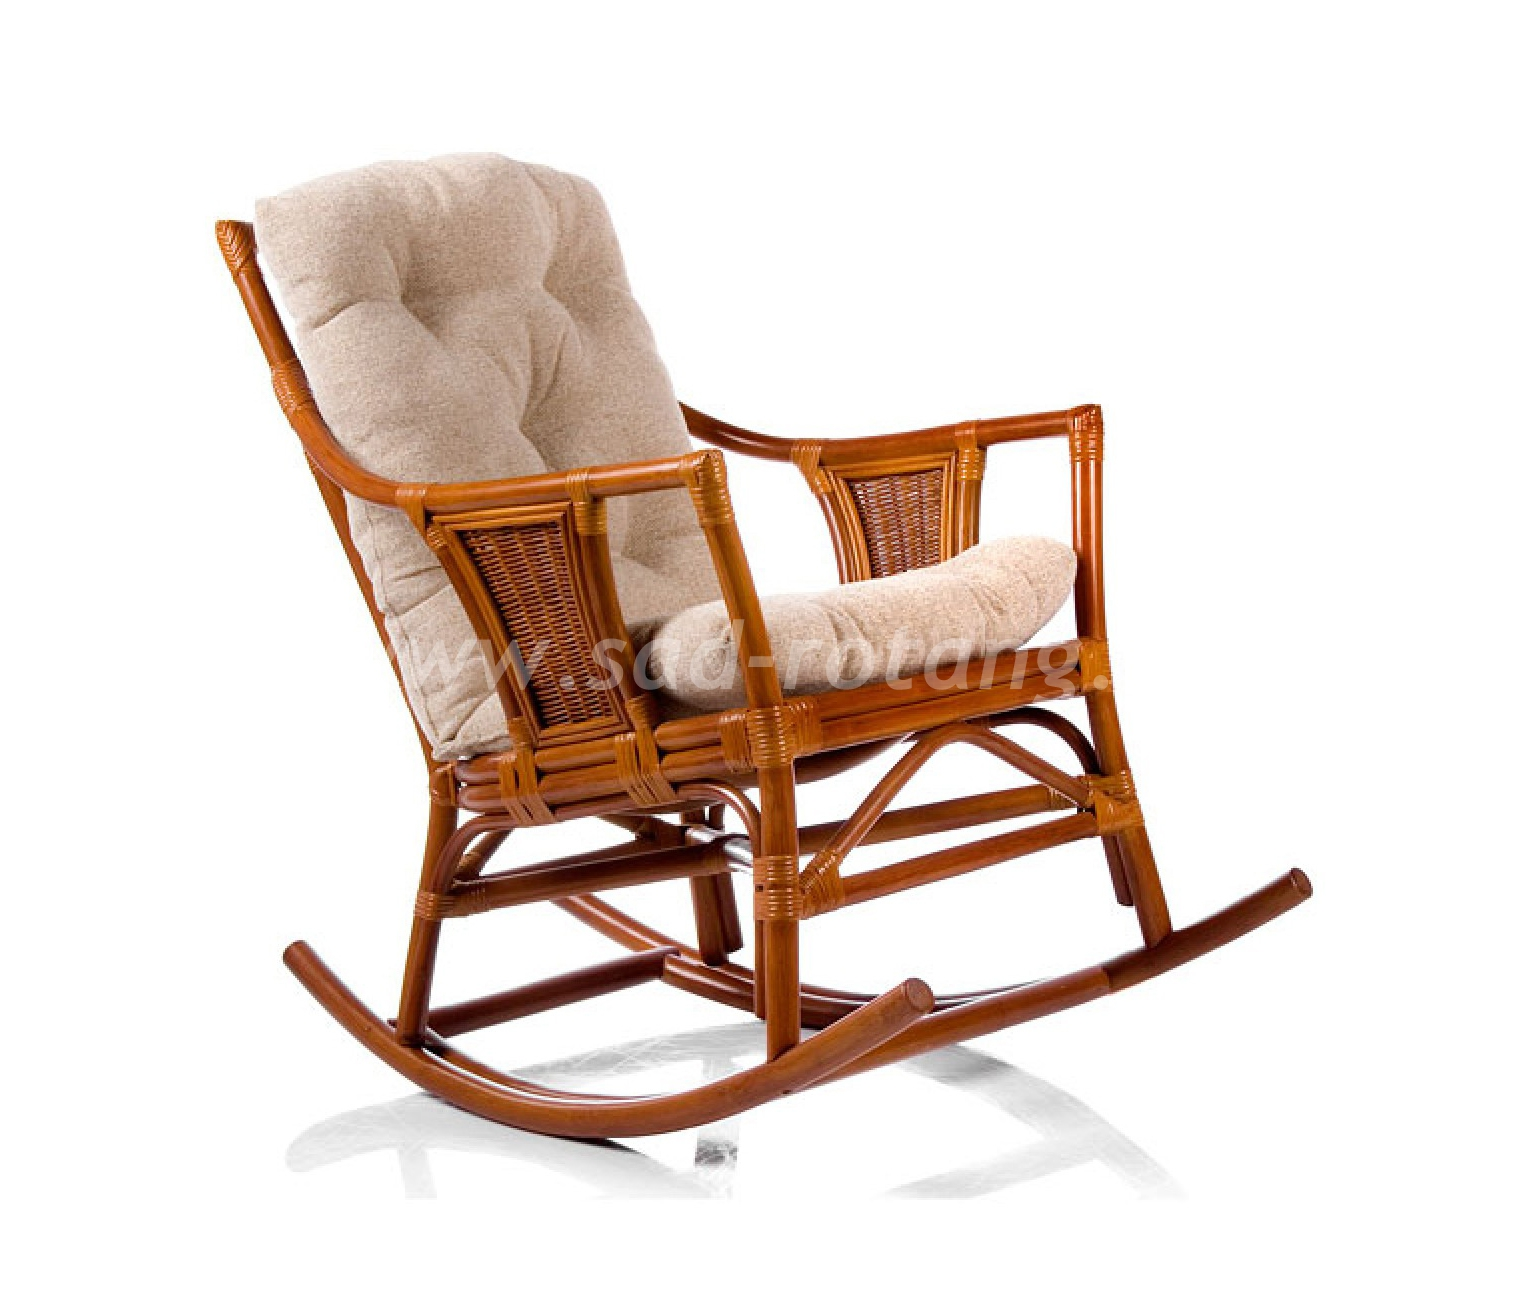 Кресло-качалка Canary (коньяк) (Индонезия)